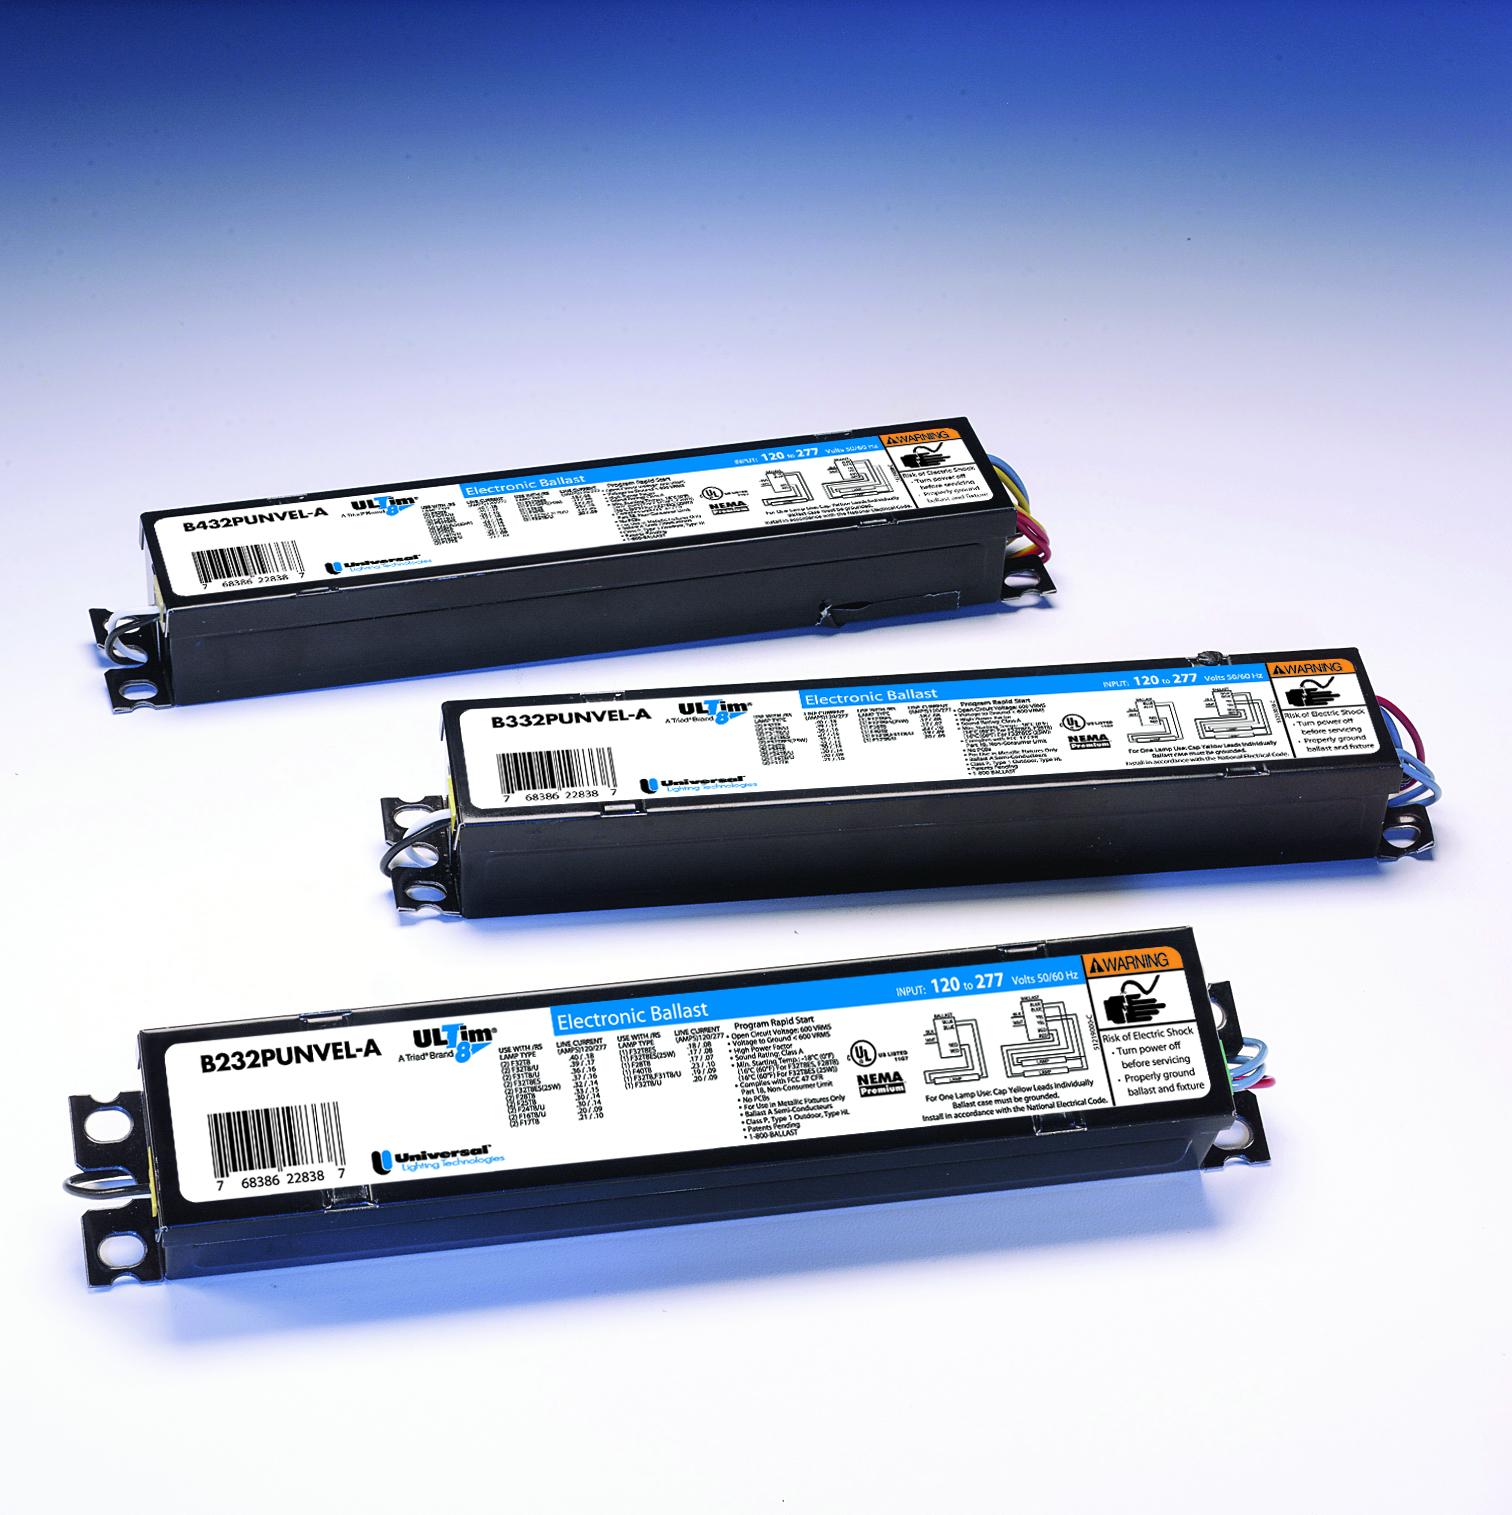 Universal Lighting Technologies B332IUNVHP-A000I UNIVERSAL LIGHTING TECH B332IUNVHPA000I